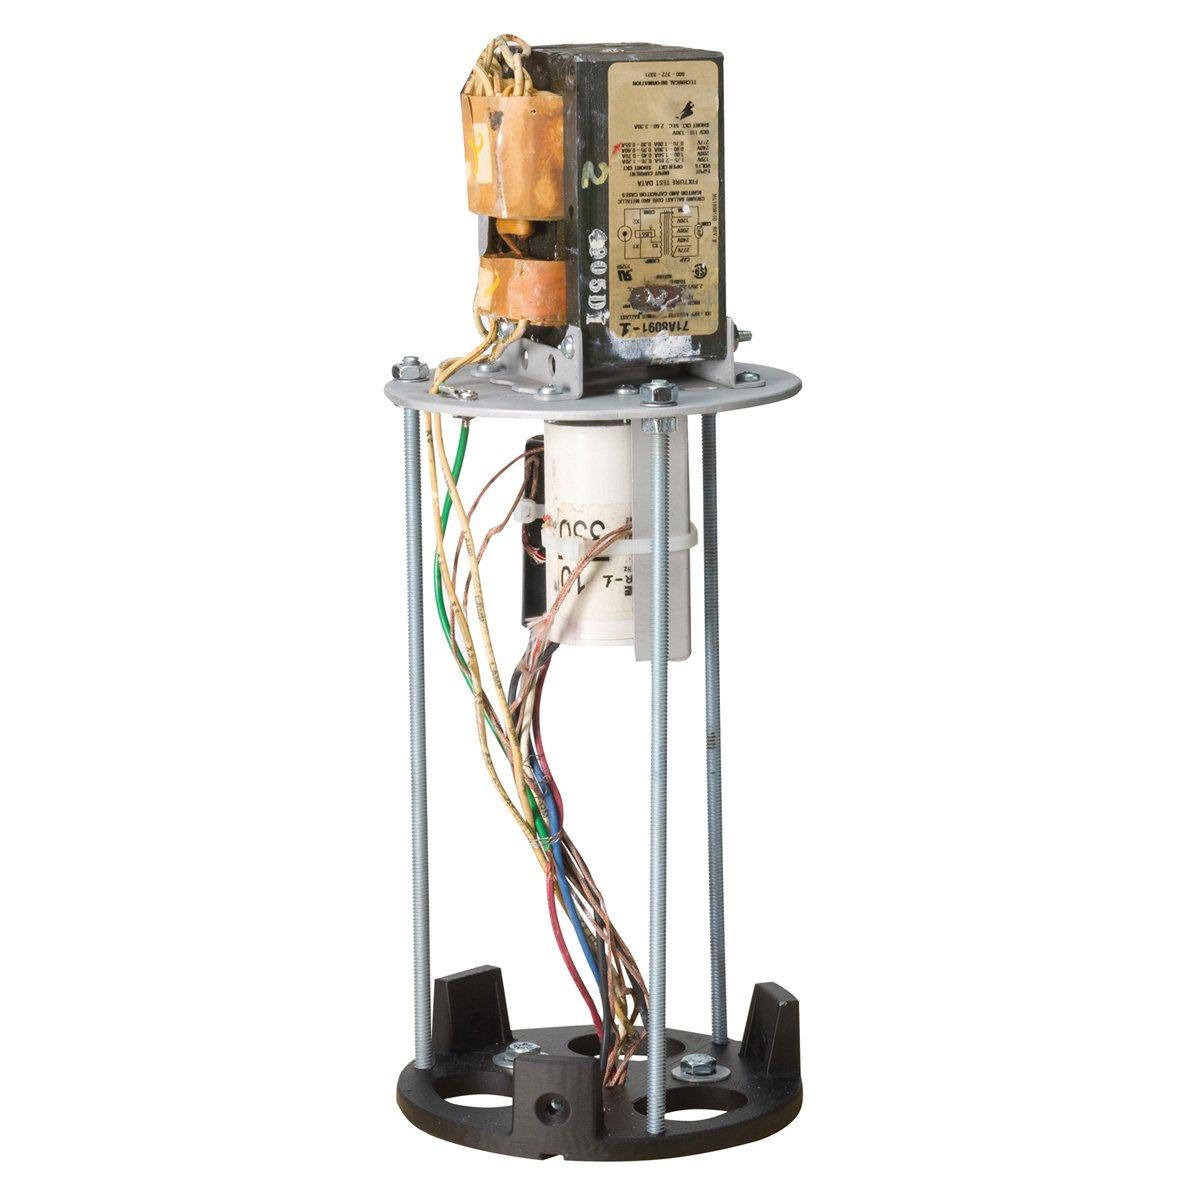 Kichler Lighting 15BLMH50BK Aluminum HID Metal Halide 120-volt to 277-volt Ballast Assembly, 50-watt, Black